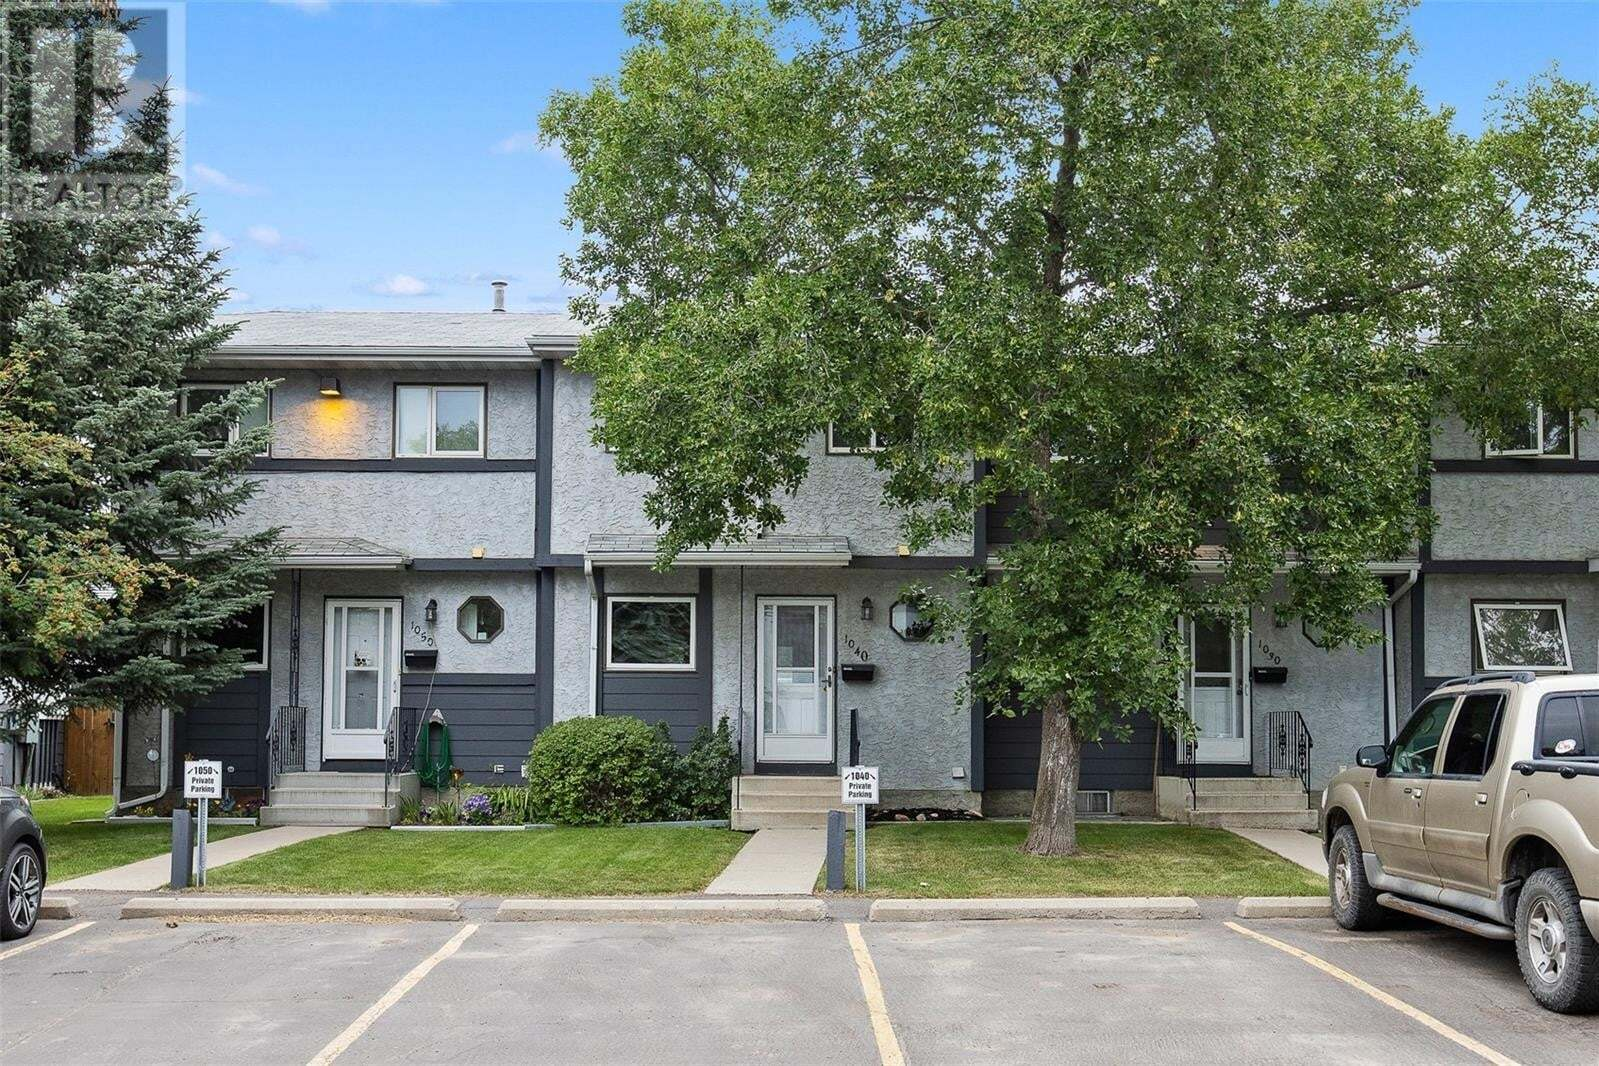 Townhouse for sale at 140 Meilicke Rd Unit 1040 Saskatoon Saskatchewan - MLS: SK821099